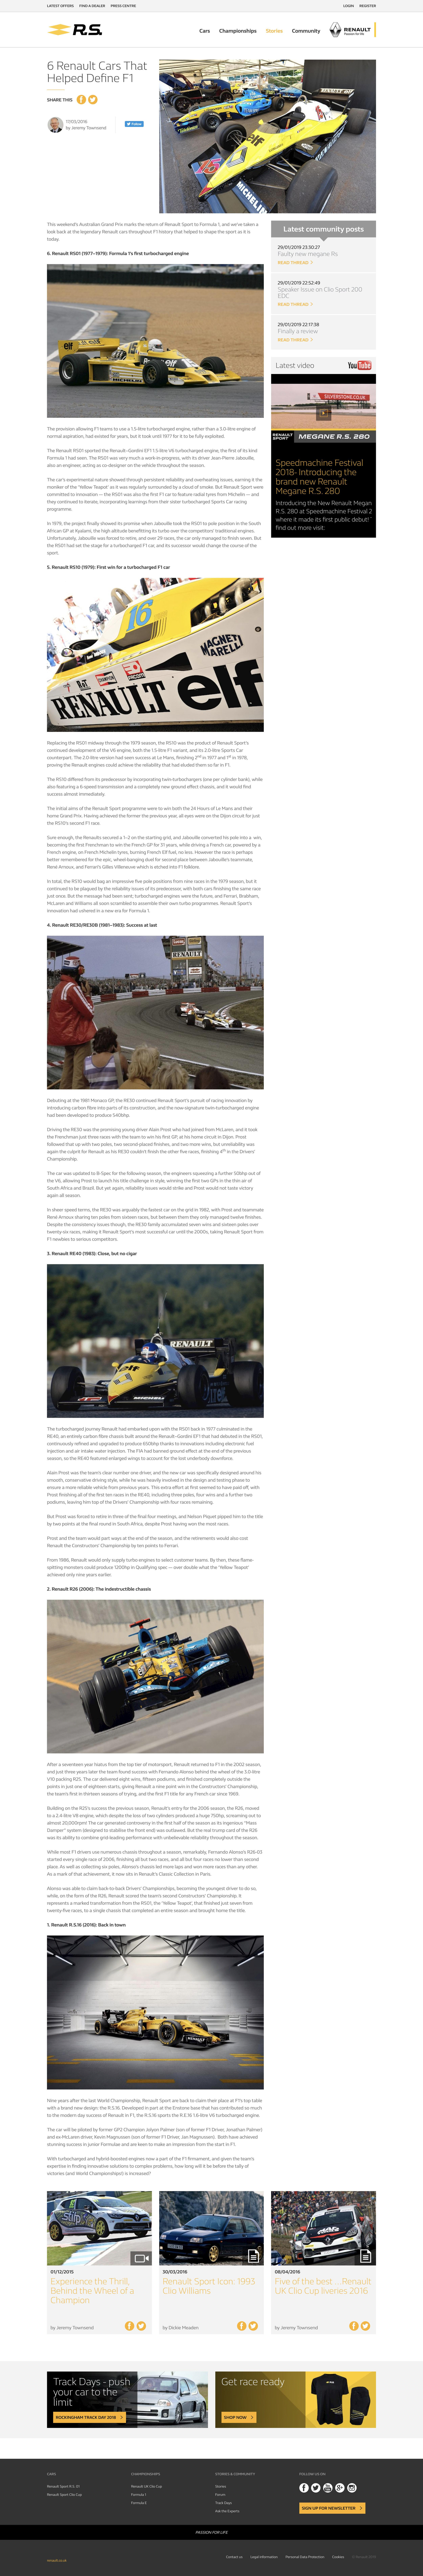 RenaultSportF1.jpg